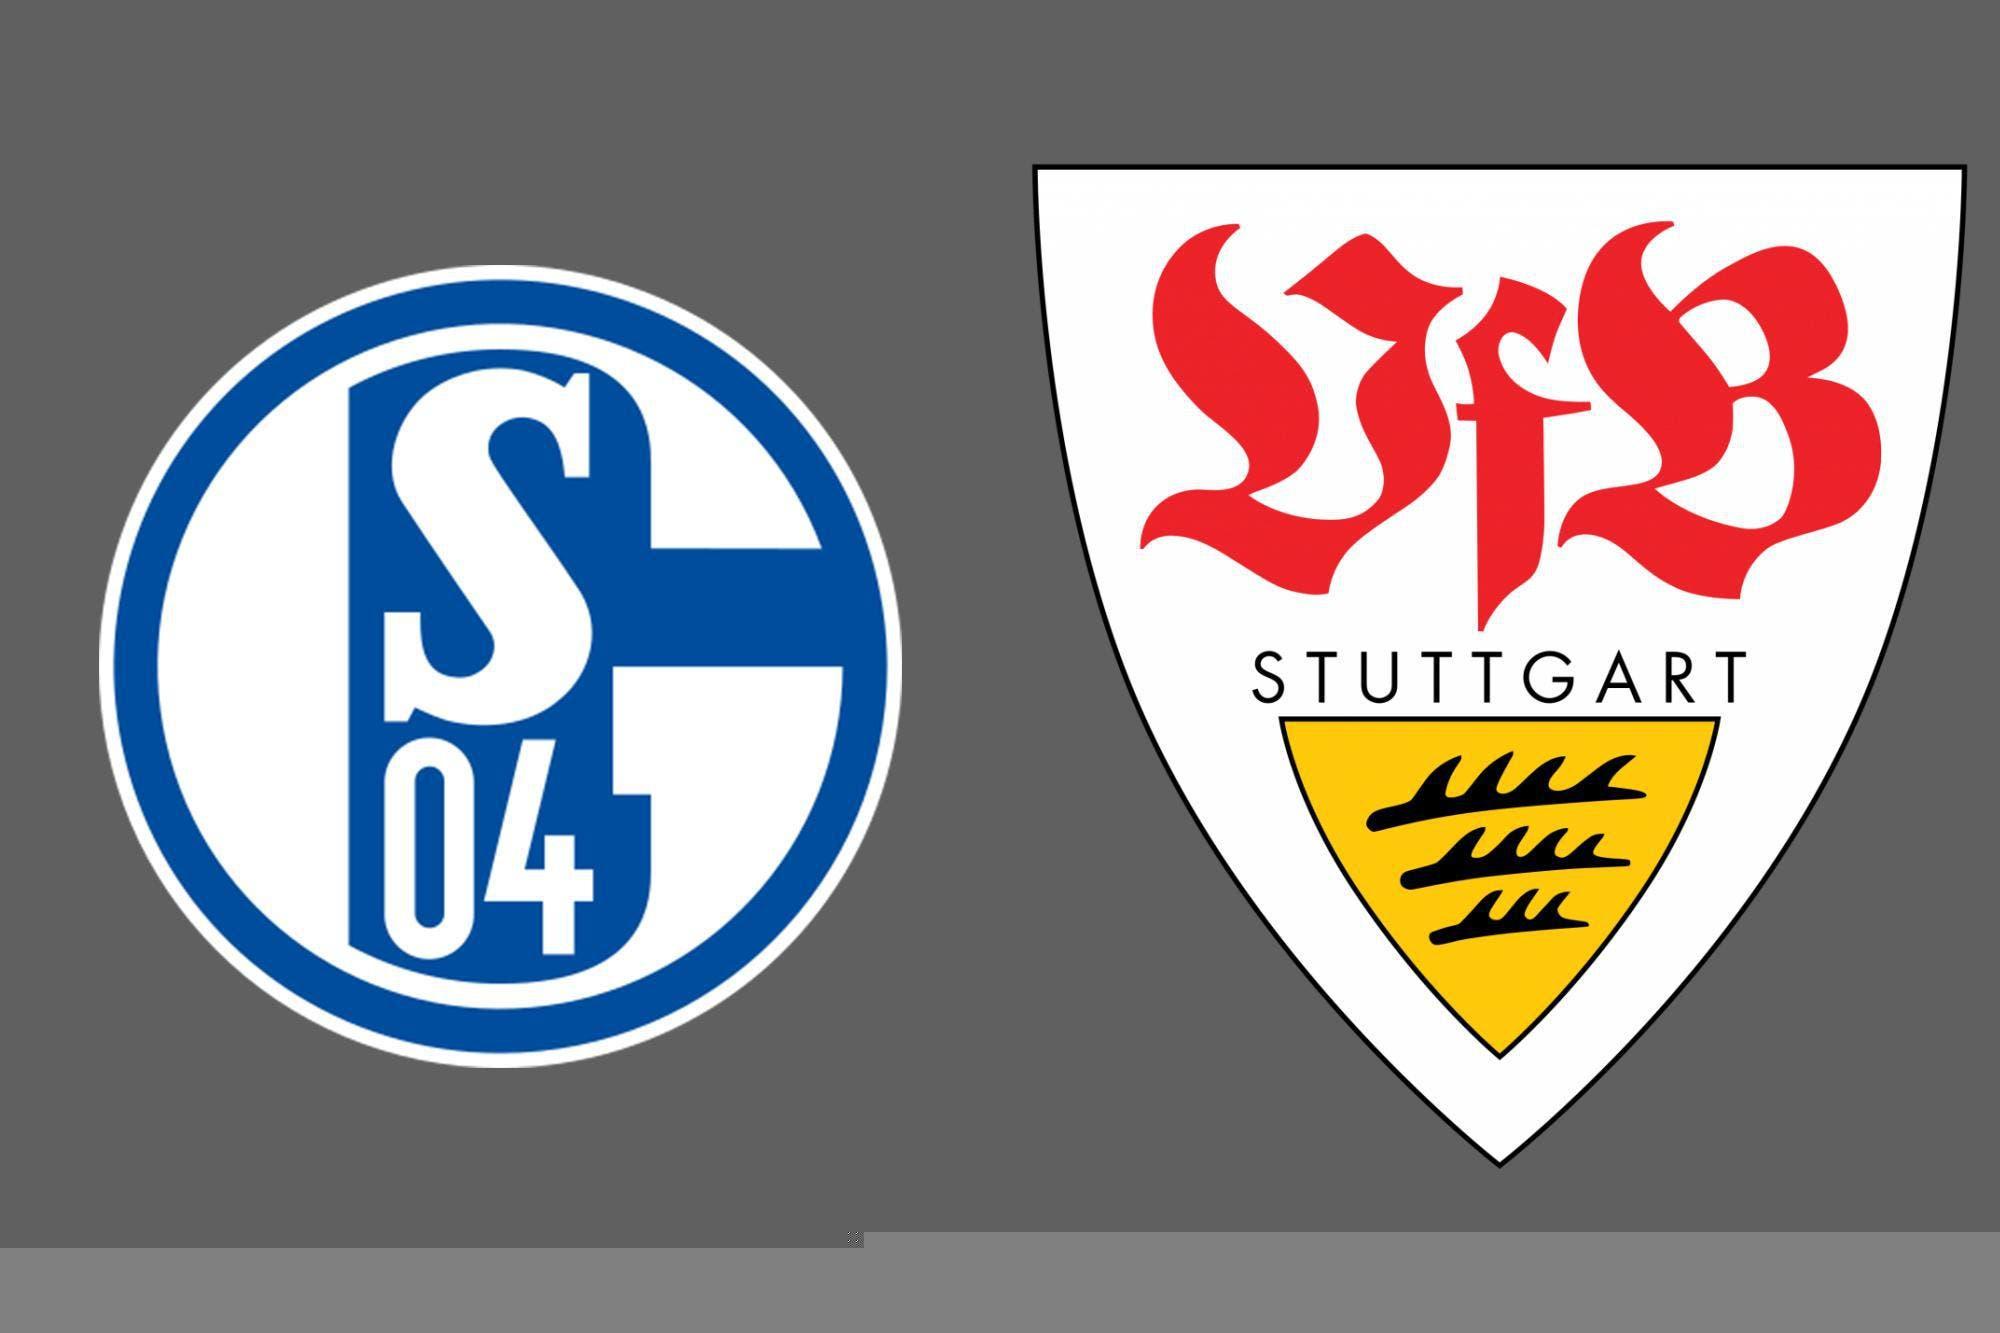 Bundesliga de Alemania: Schalke 04 y Stuttgart empataron 1-1